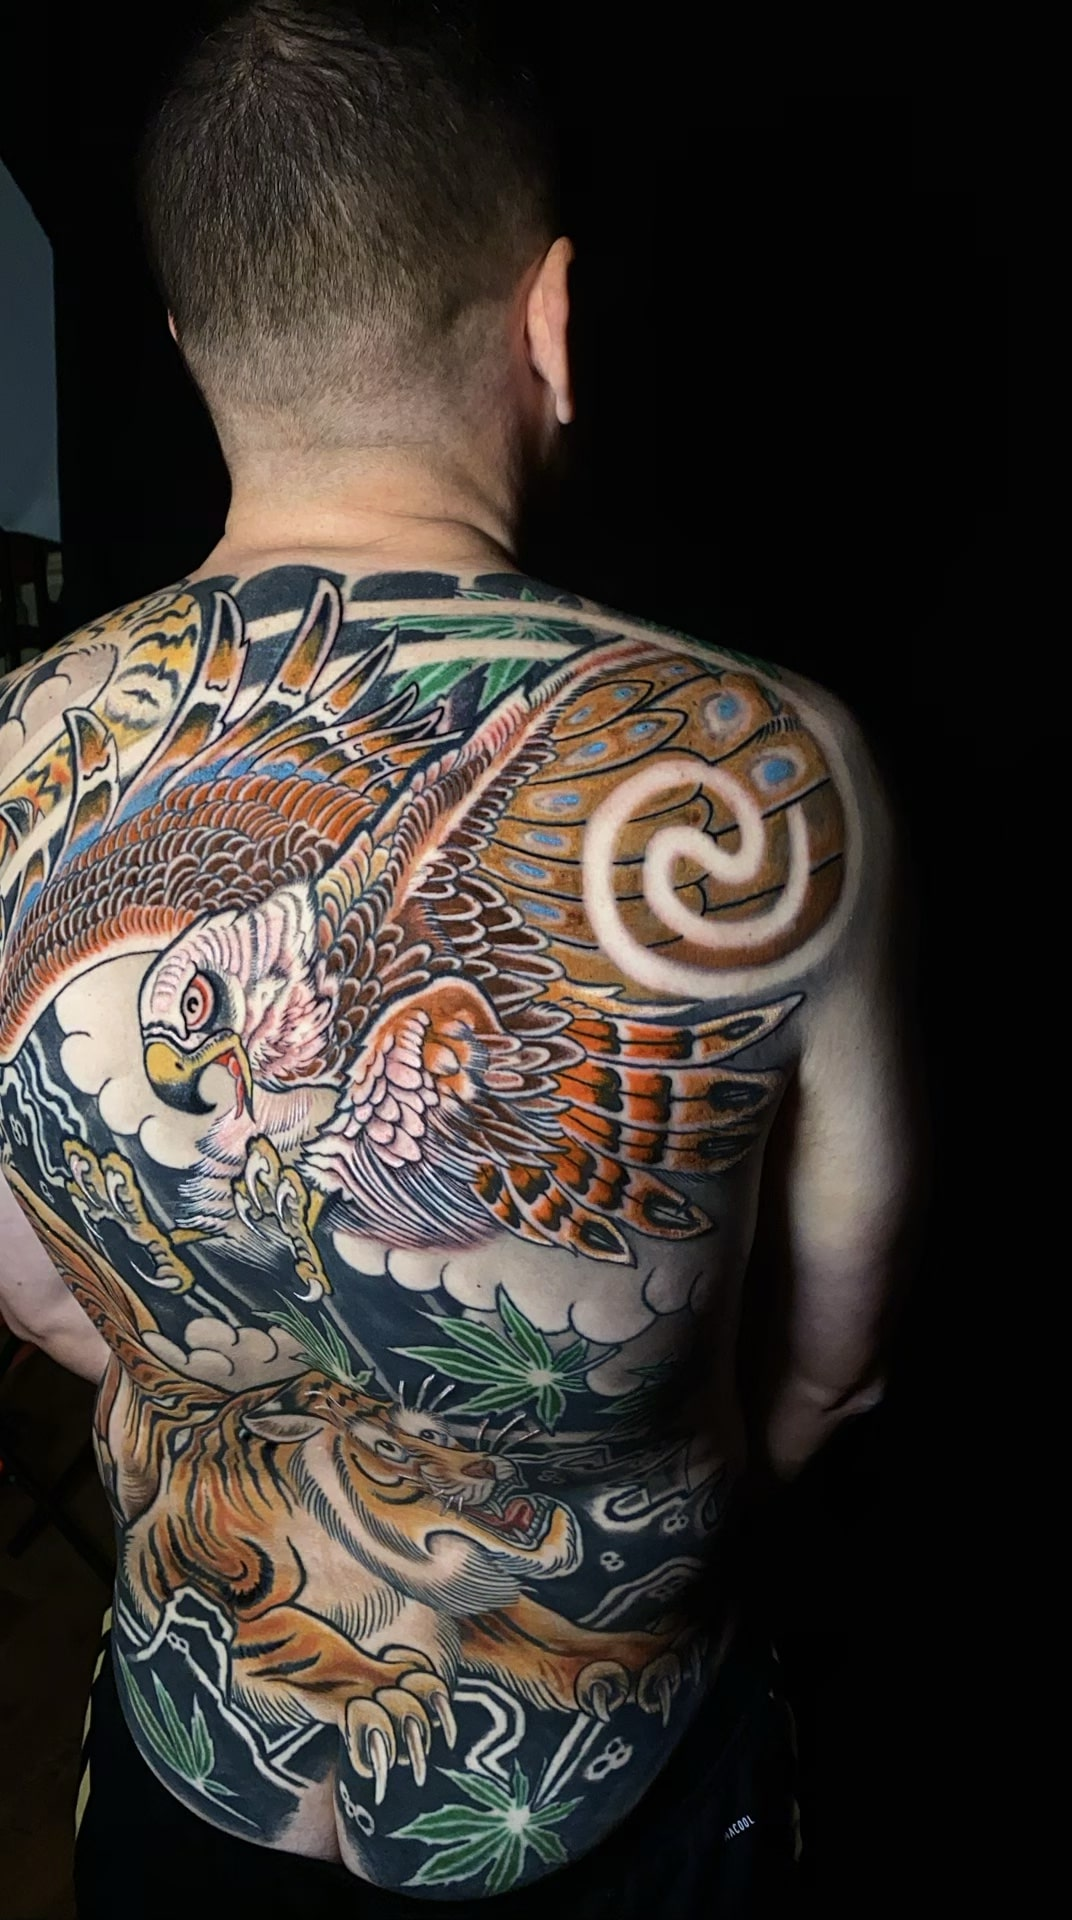 luis-cabezas-japanese-tiger-hawk-tattoo-back